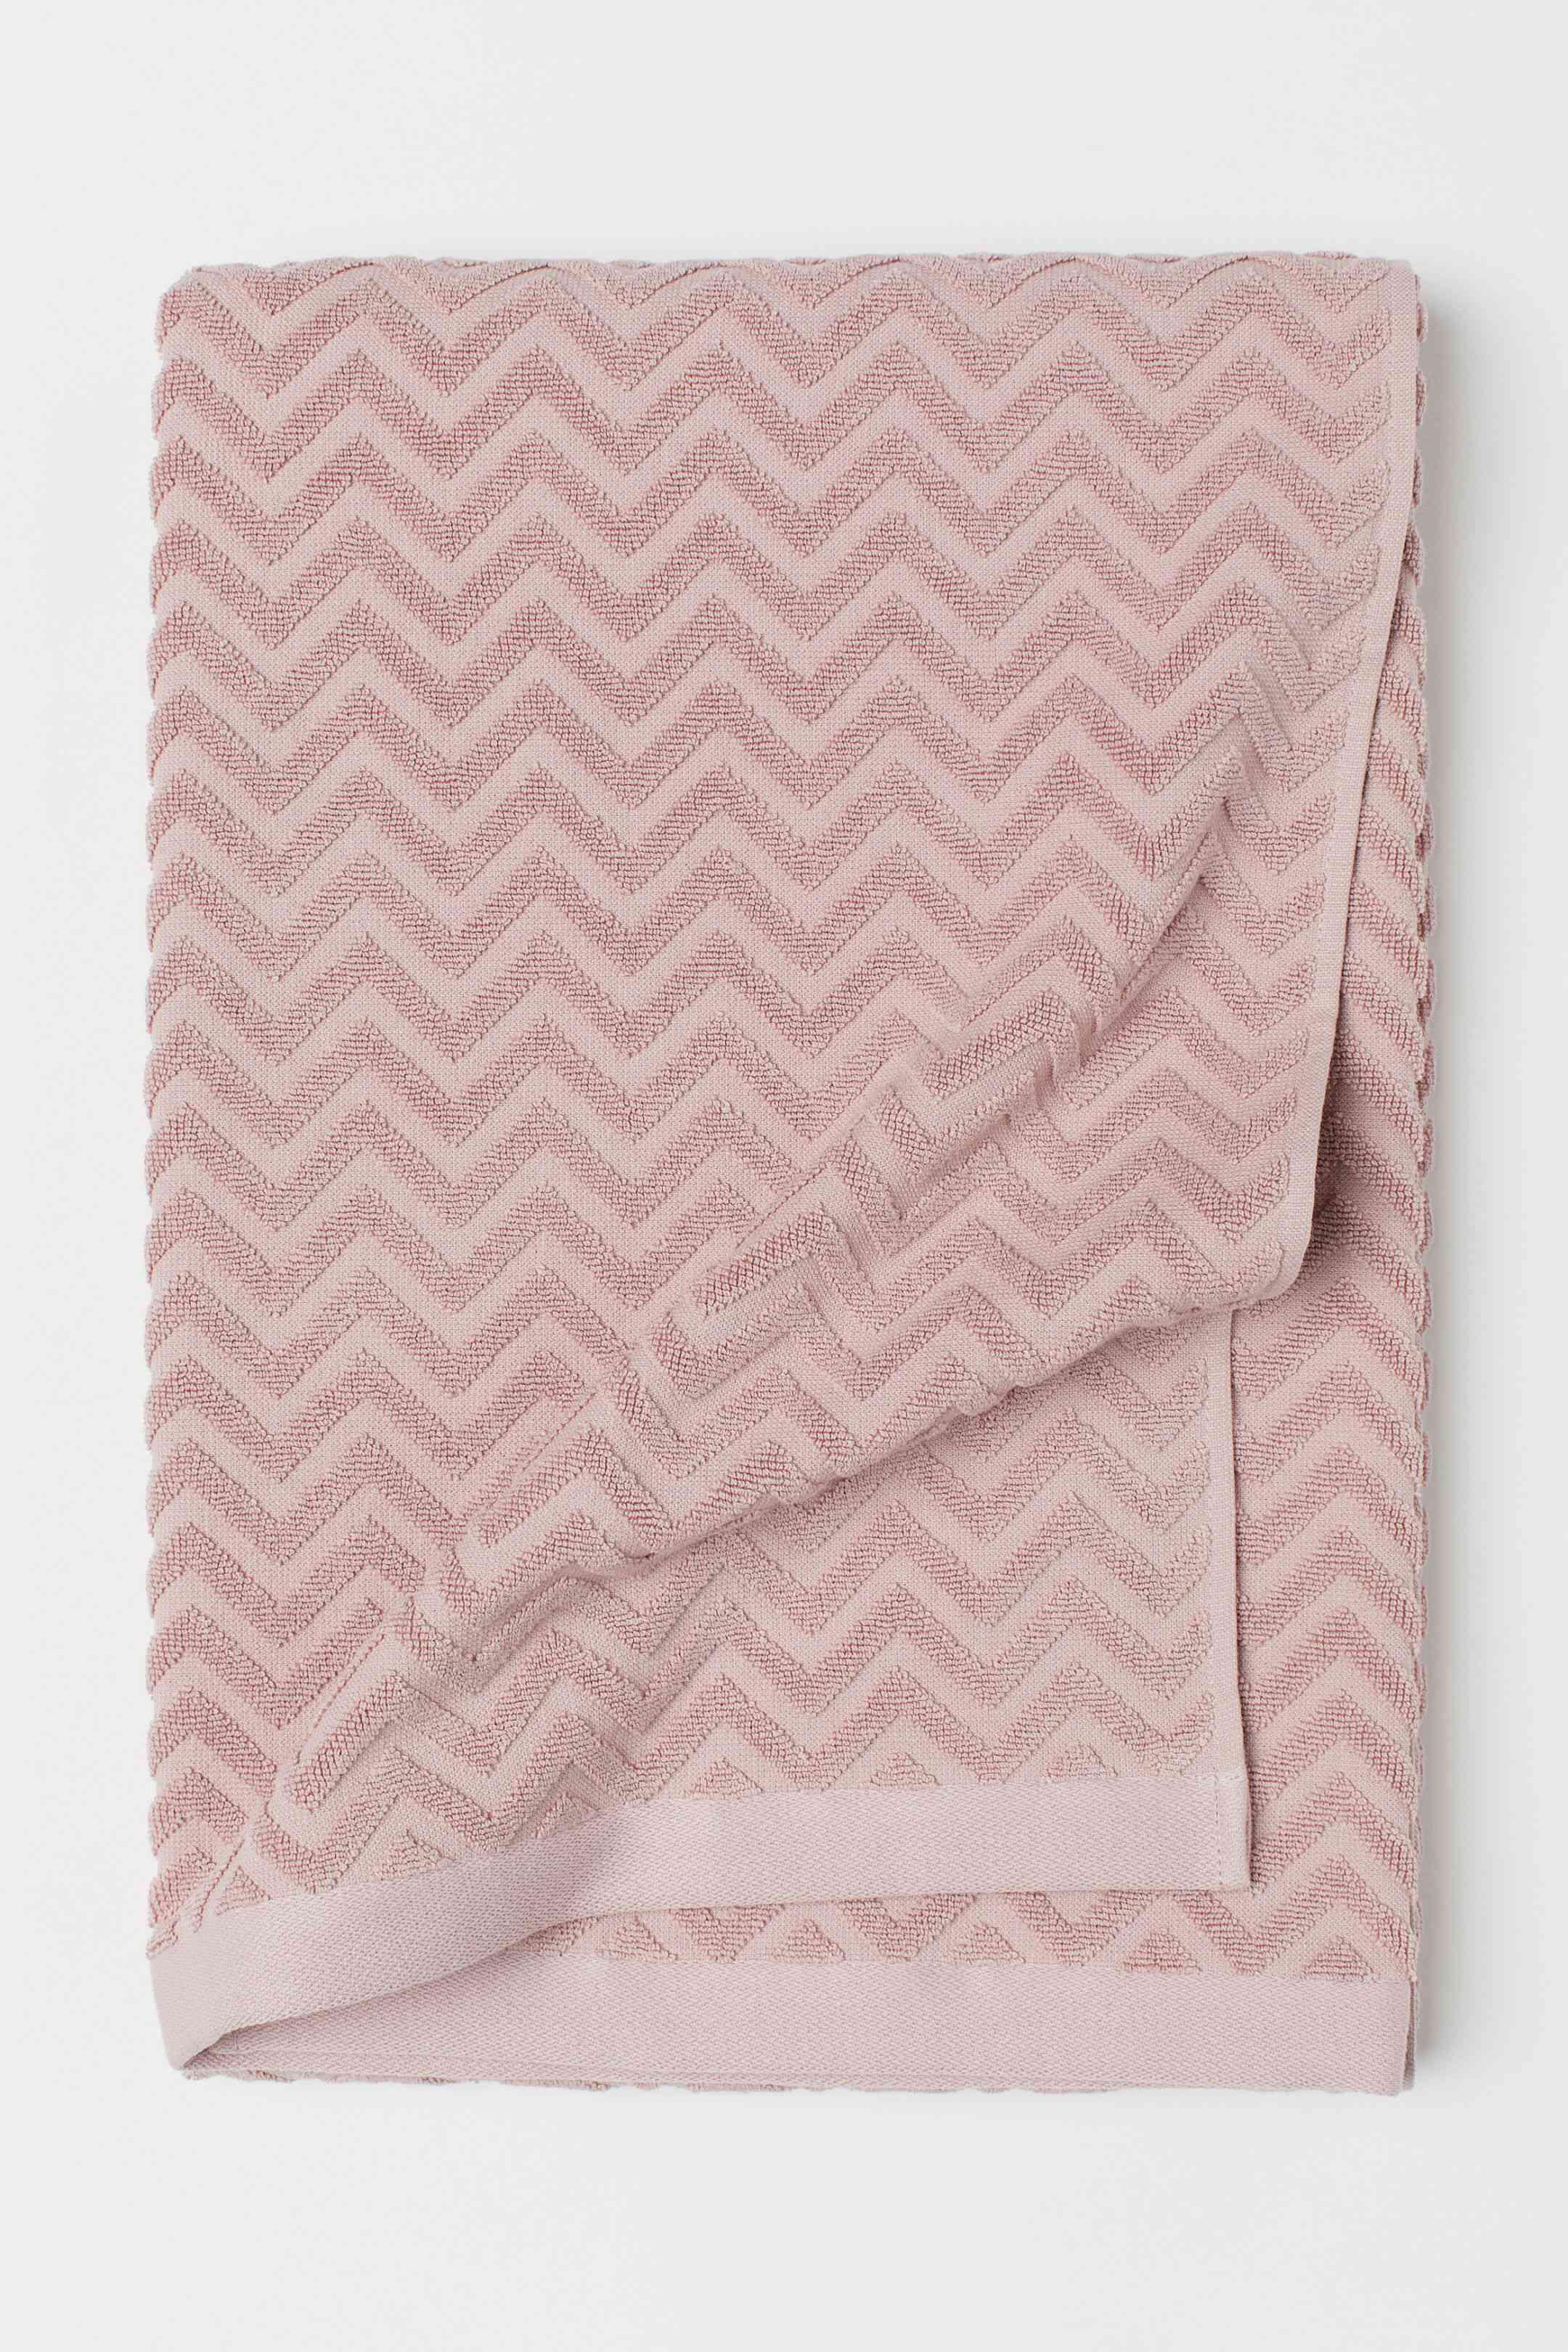 Jacquard-Weave Bath Sheet